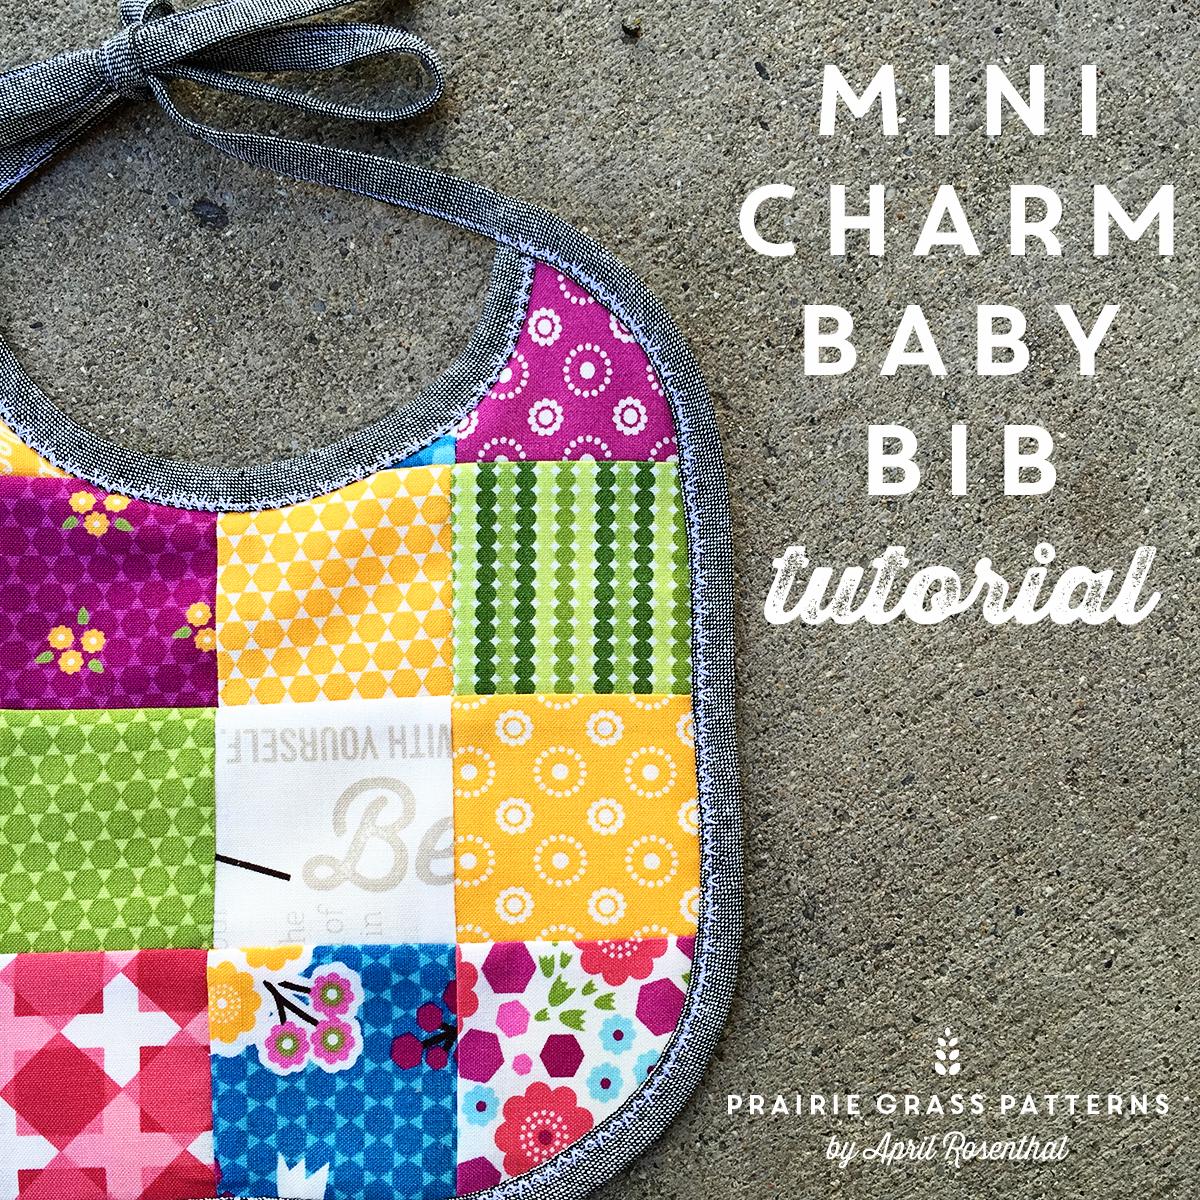 Mini Charm Baby Bib Free Tutorial April Rosenthal